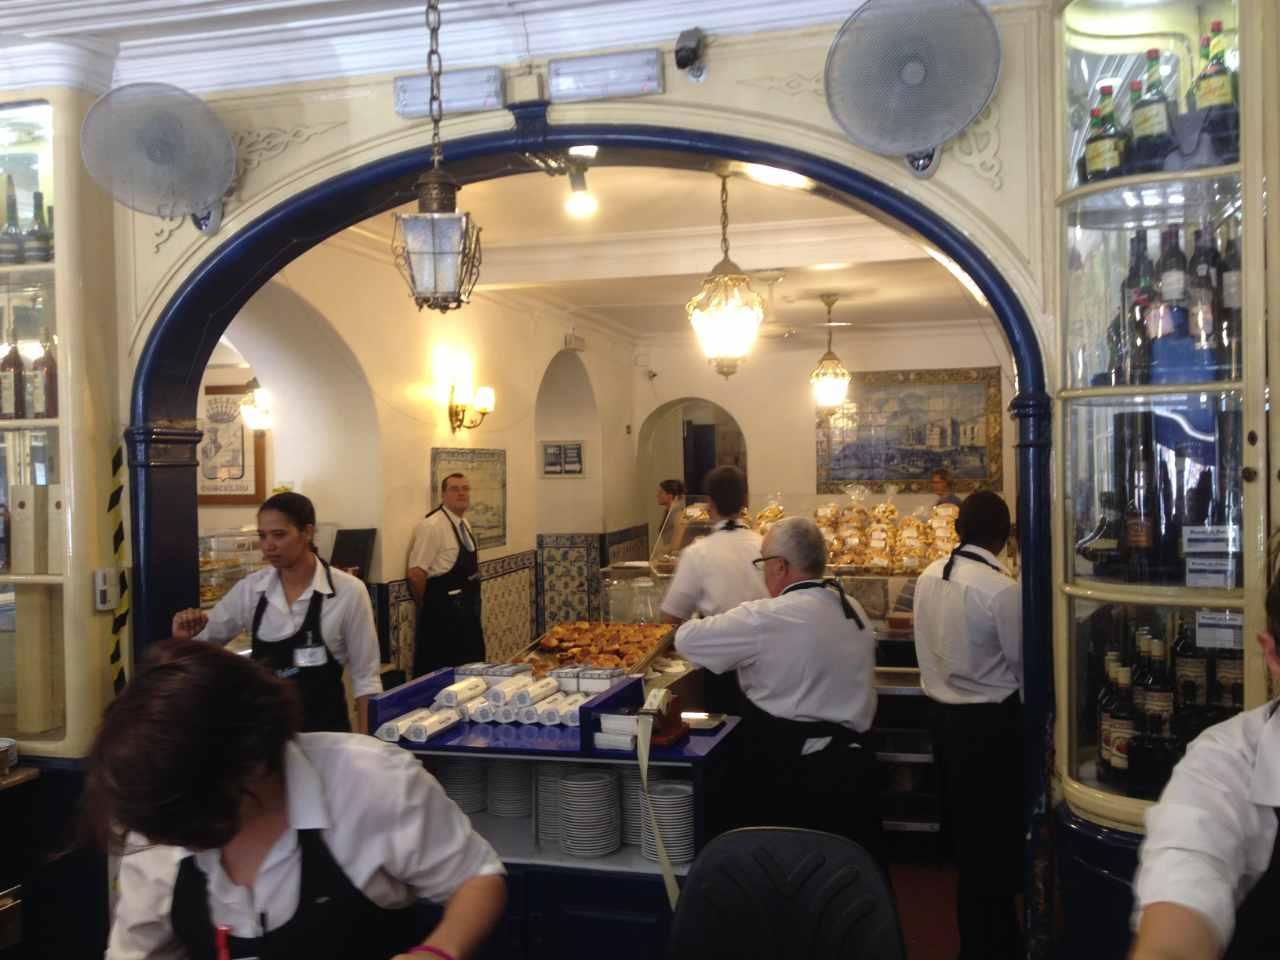 Lisboa no inverno: Pastéis de Belém